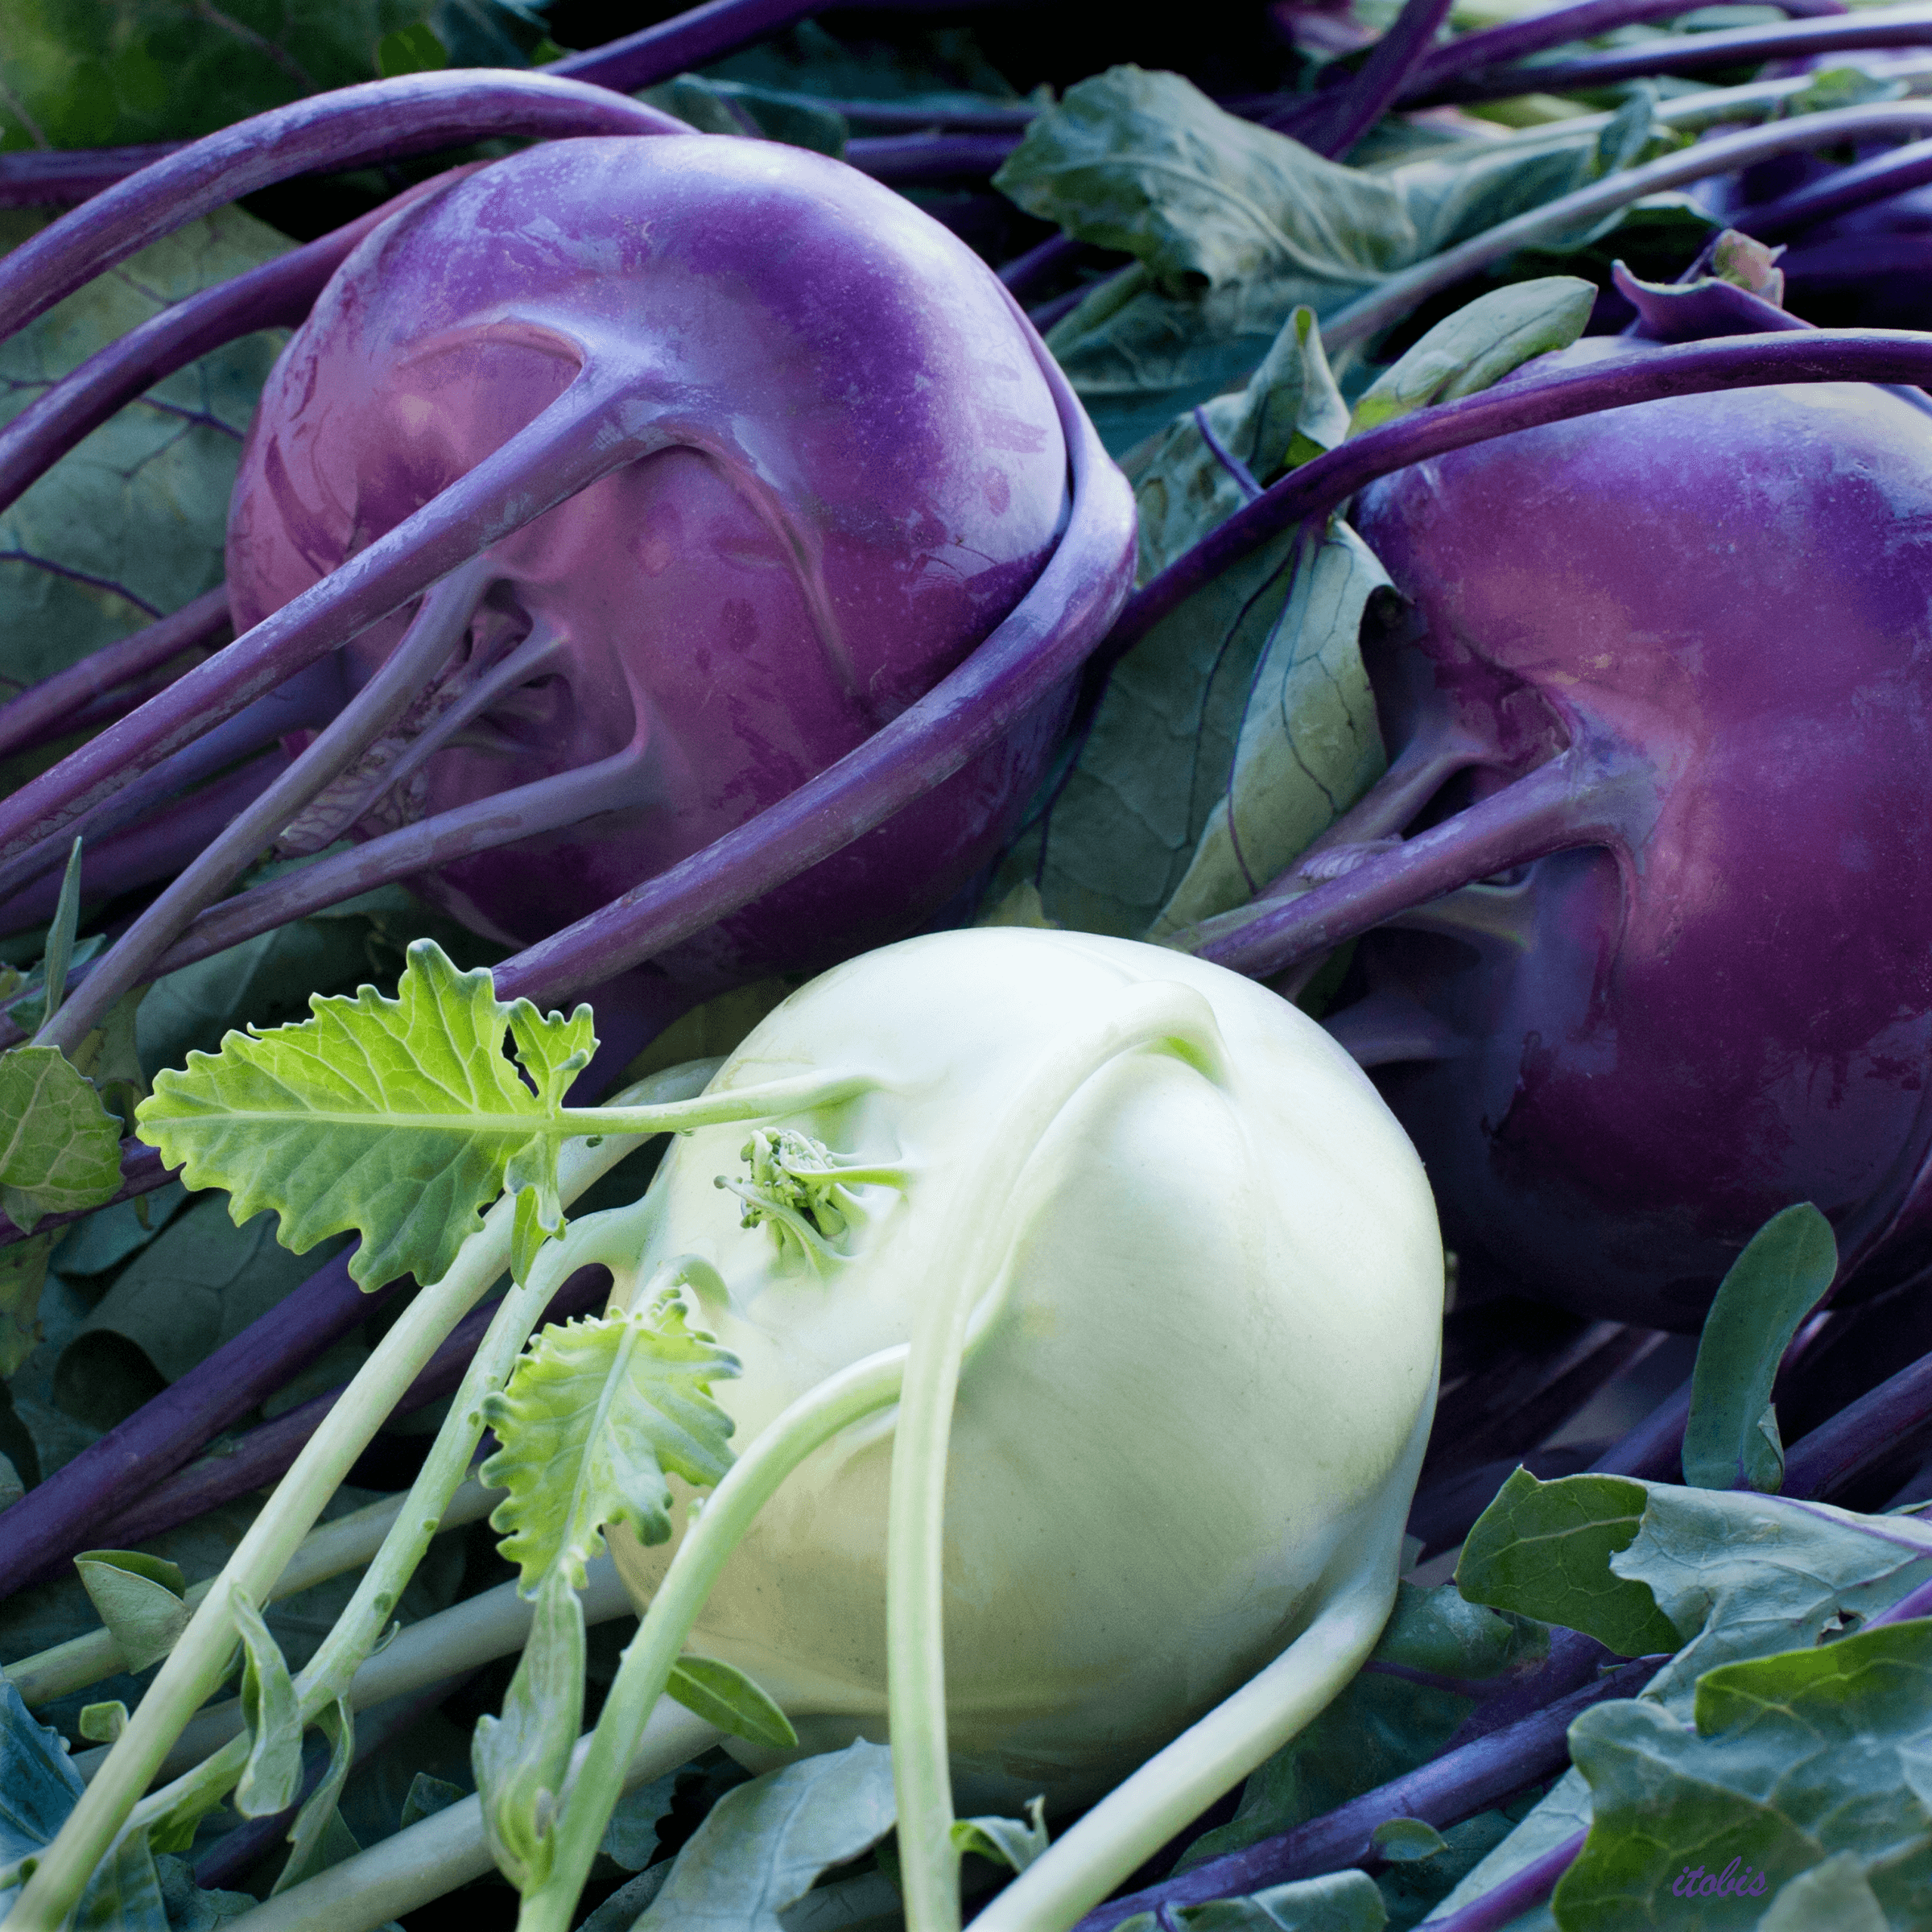 kohlrabi-farmersmarket-VF105-itobis.png